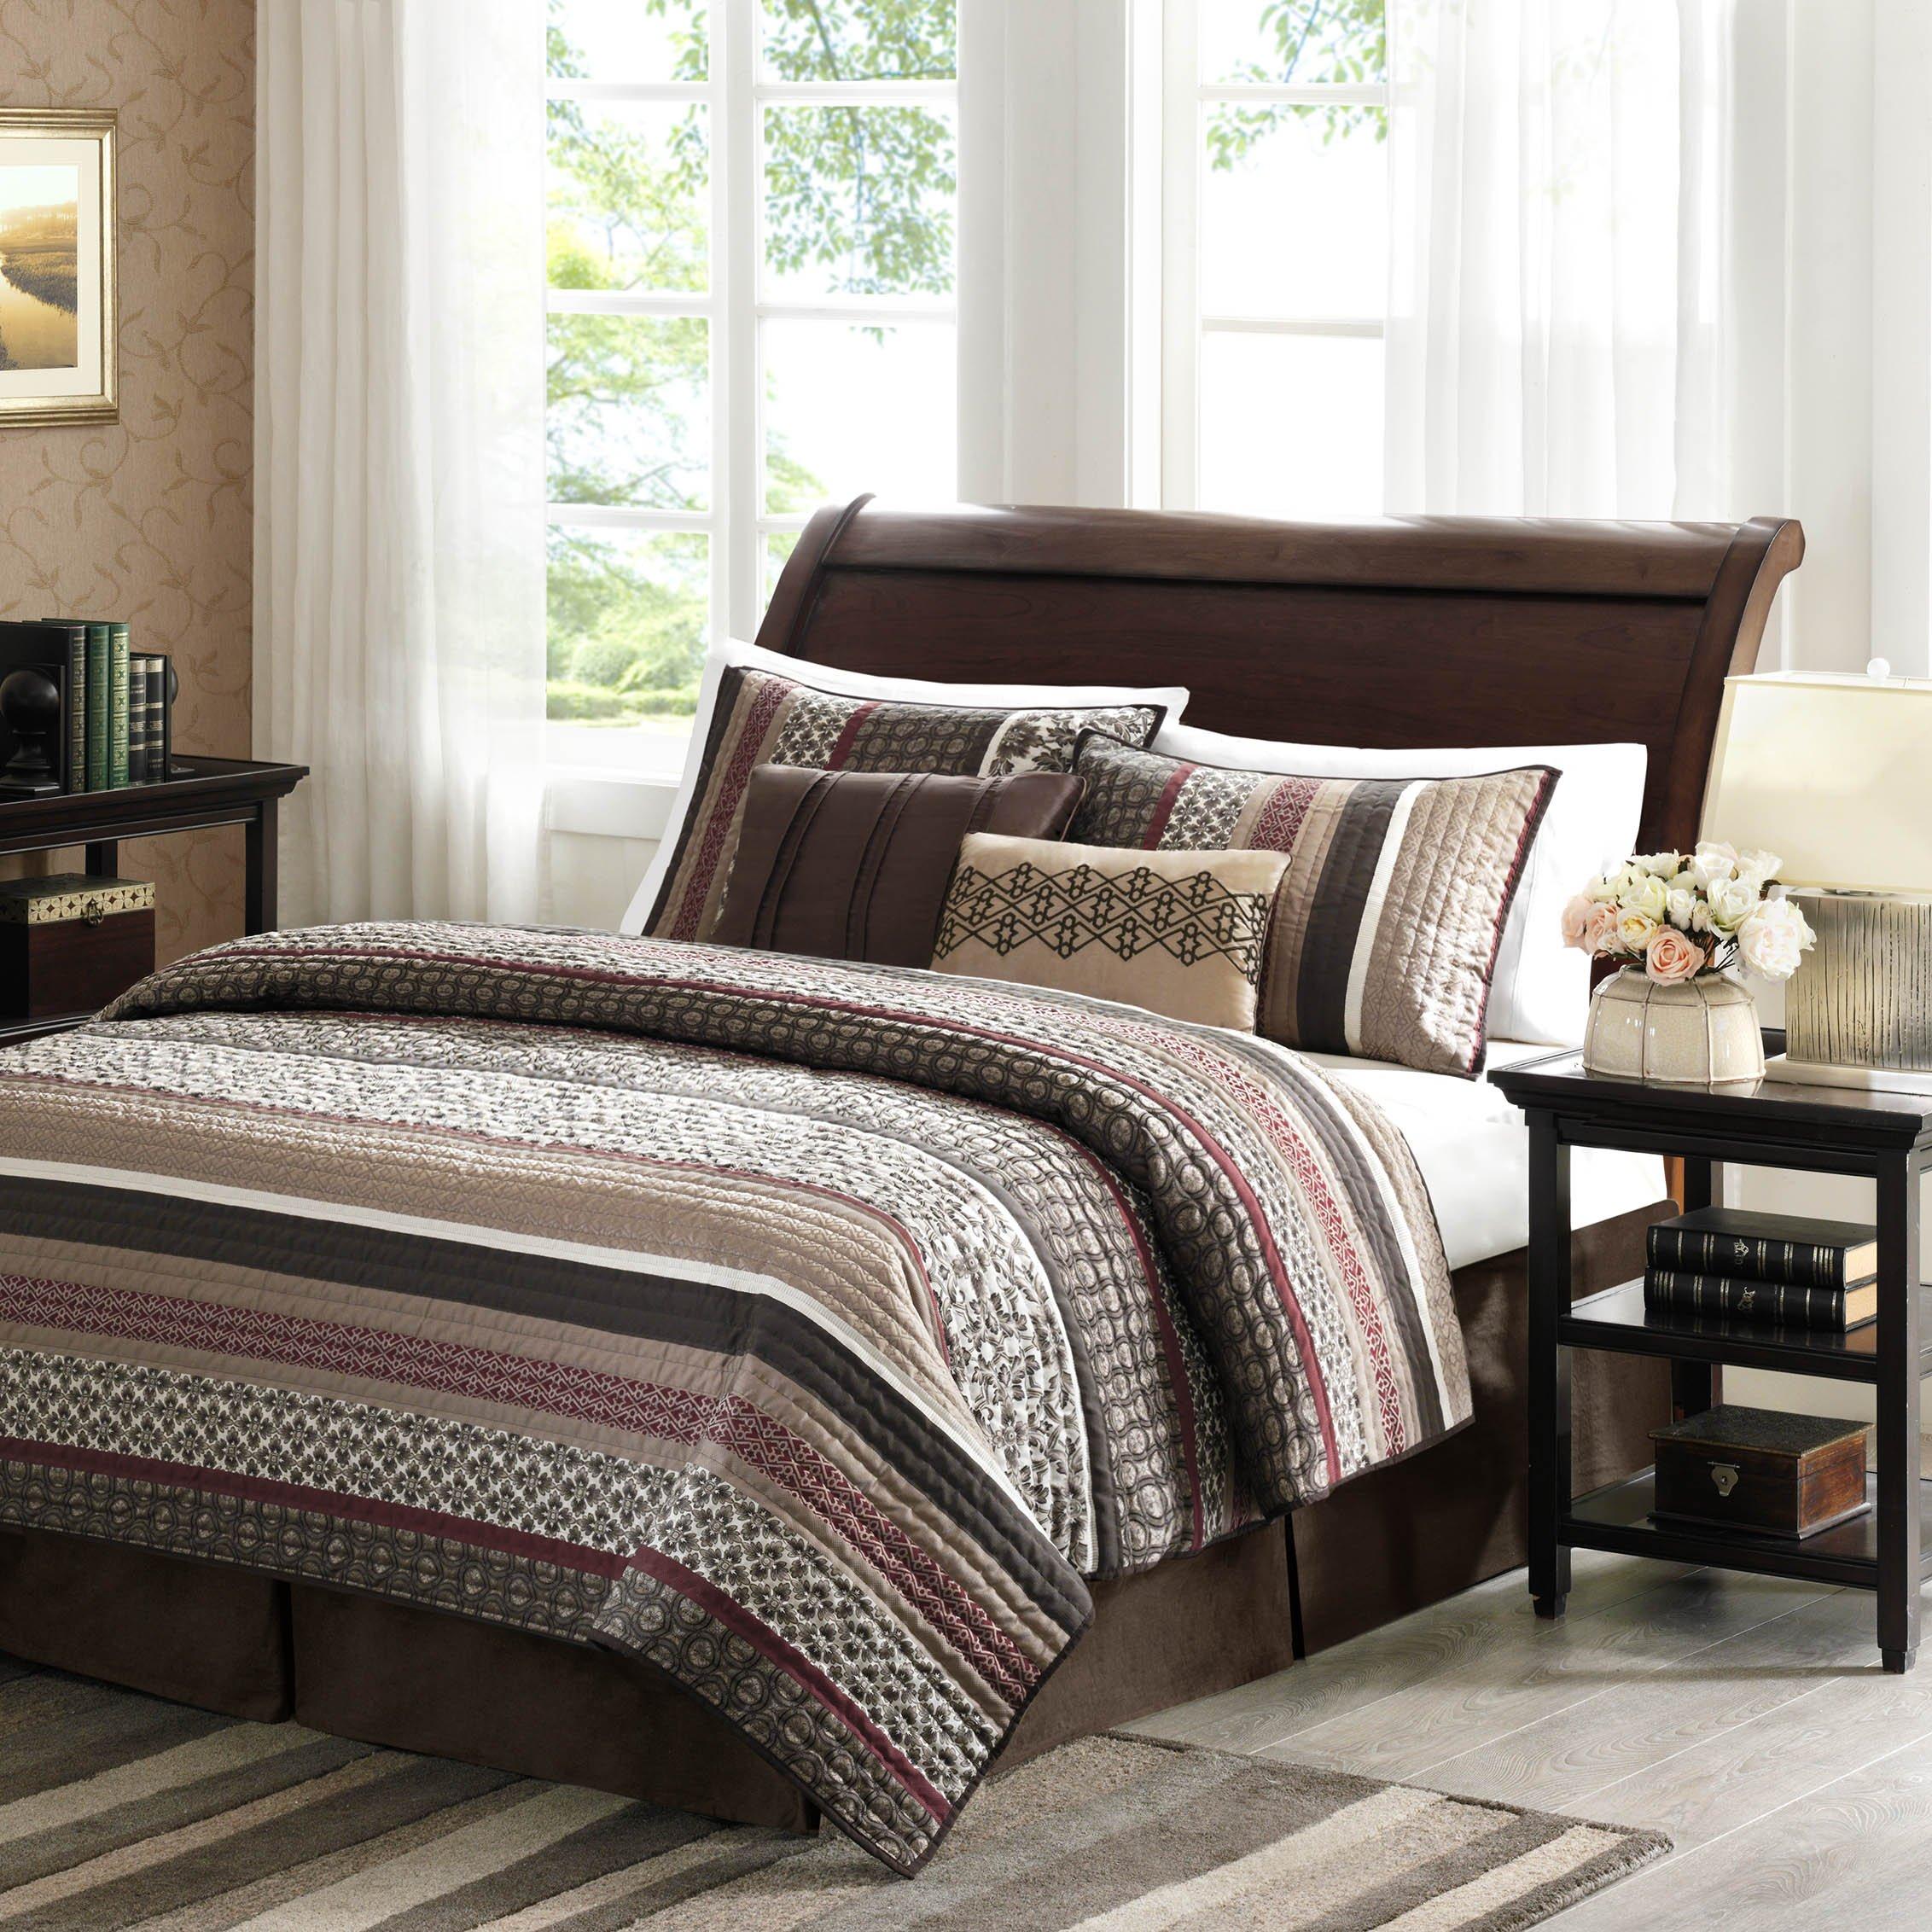 Madison park princeton king size quilt bedding set crimson red jacquard patterned striped